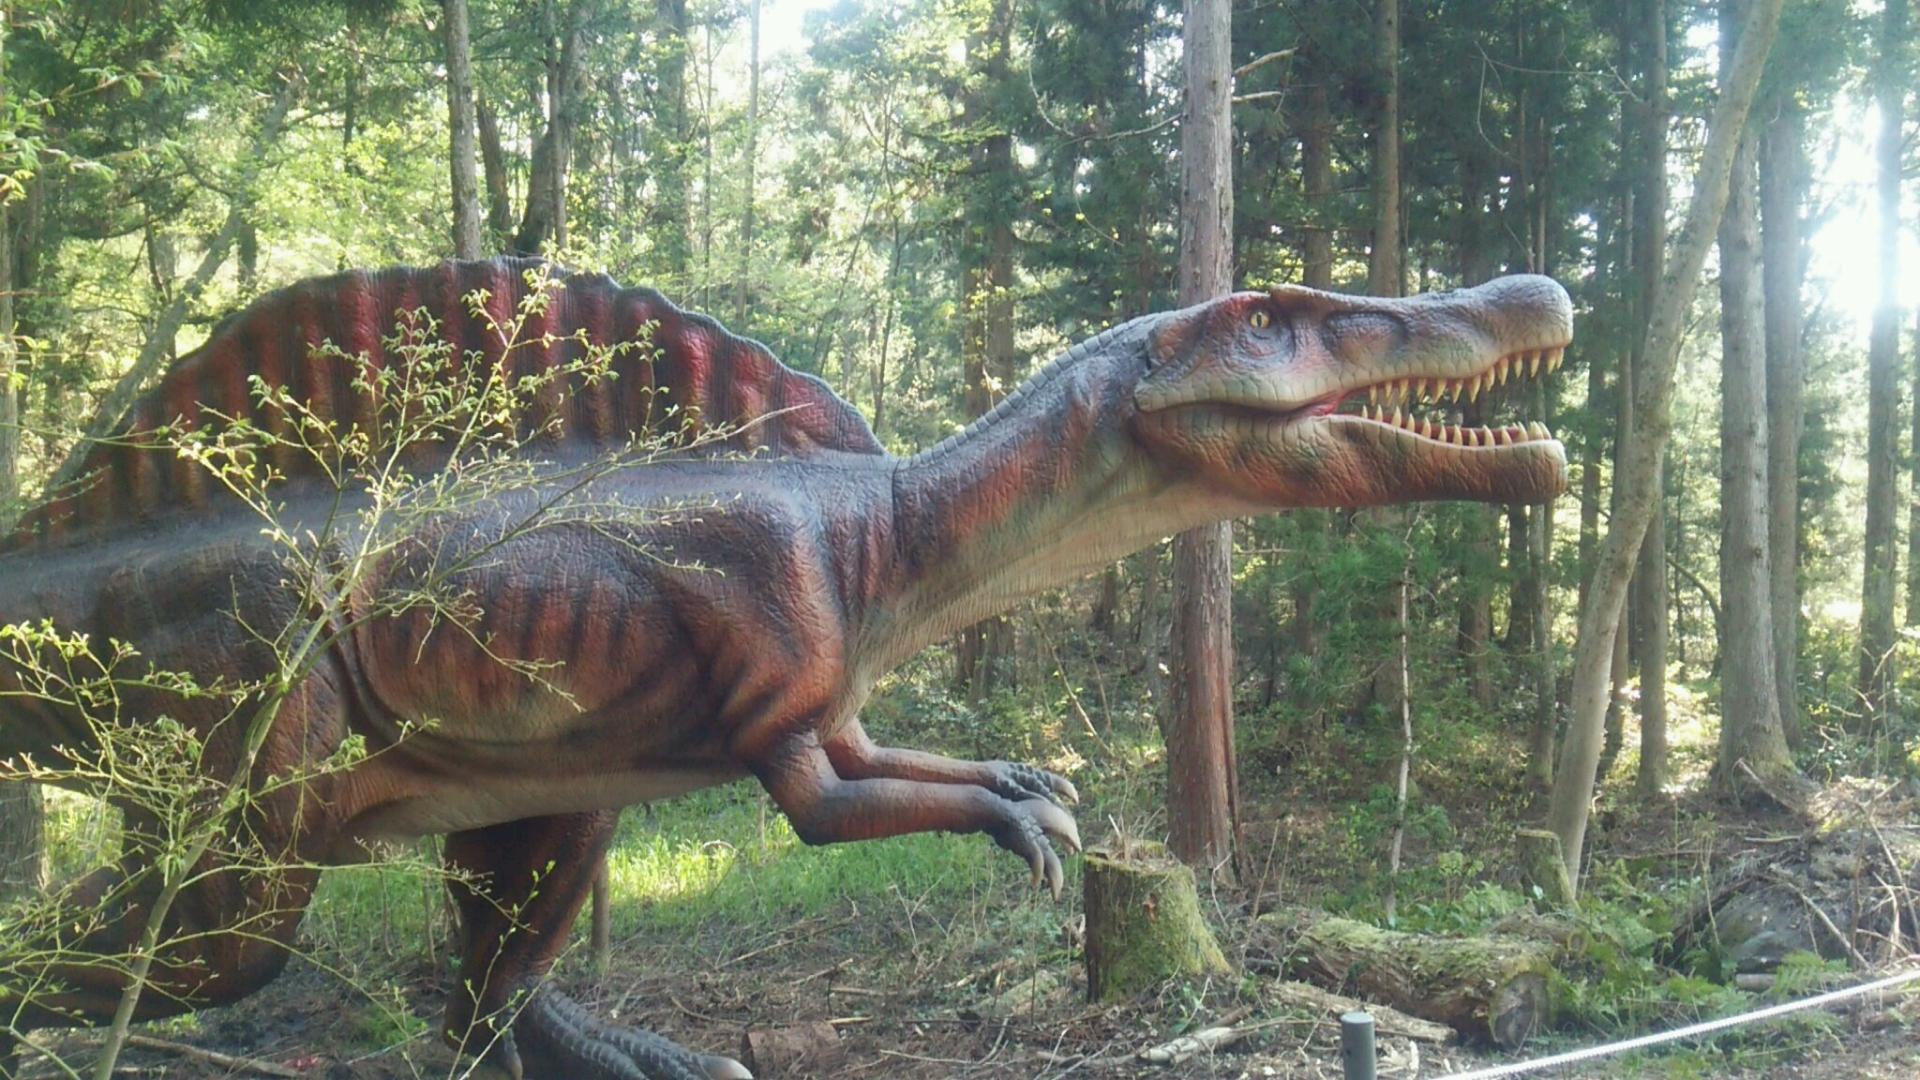 恐竜 ツアー 福井 博物館